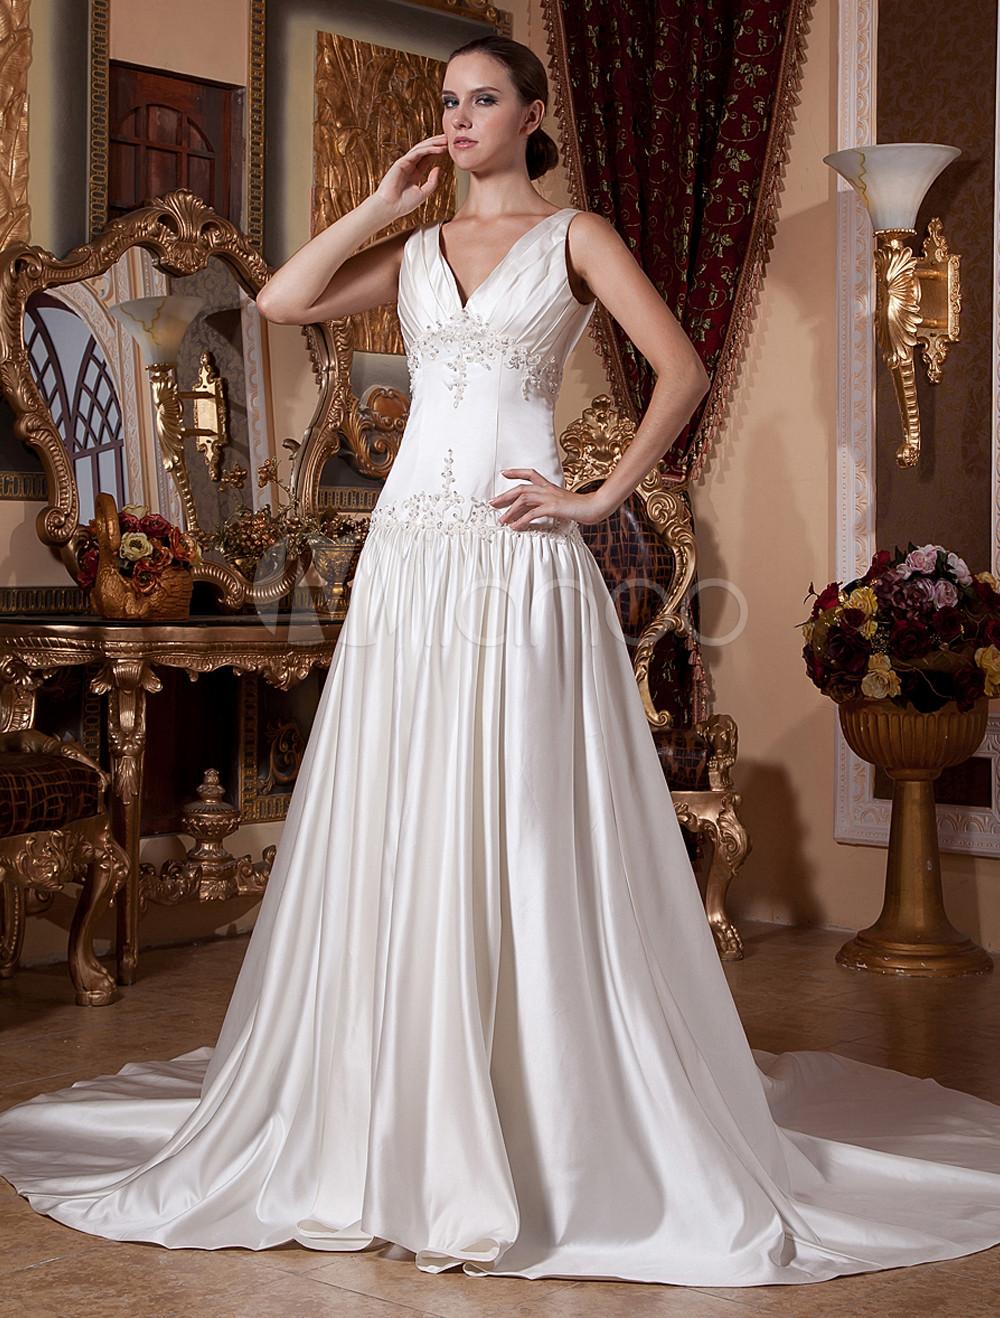 Slimming Ivory Satin V-neck Sleeveless A-line Wedding Dress ...